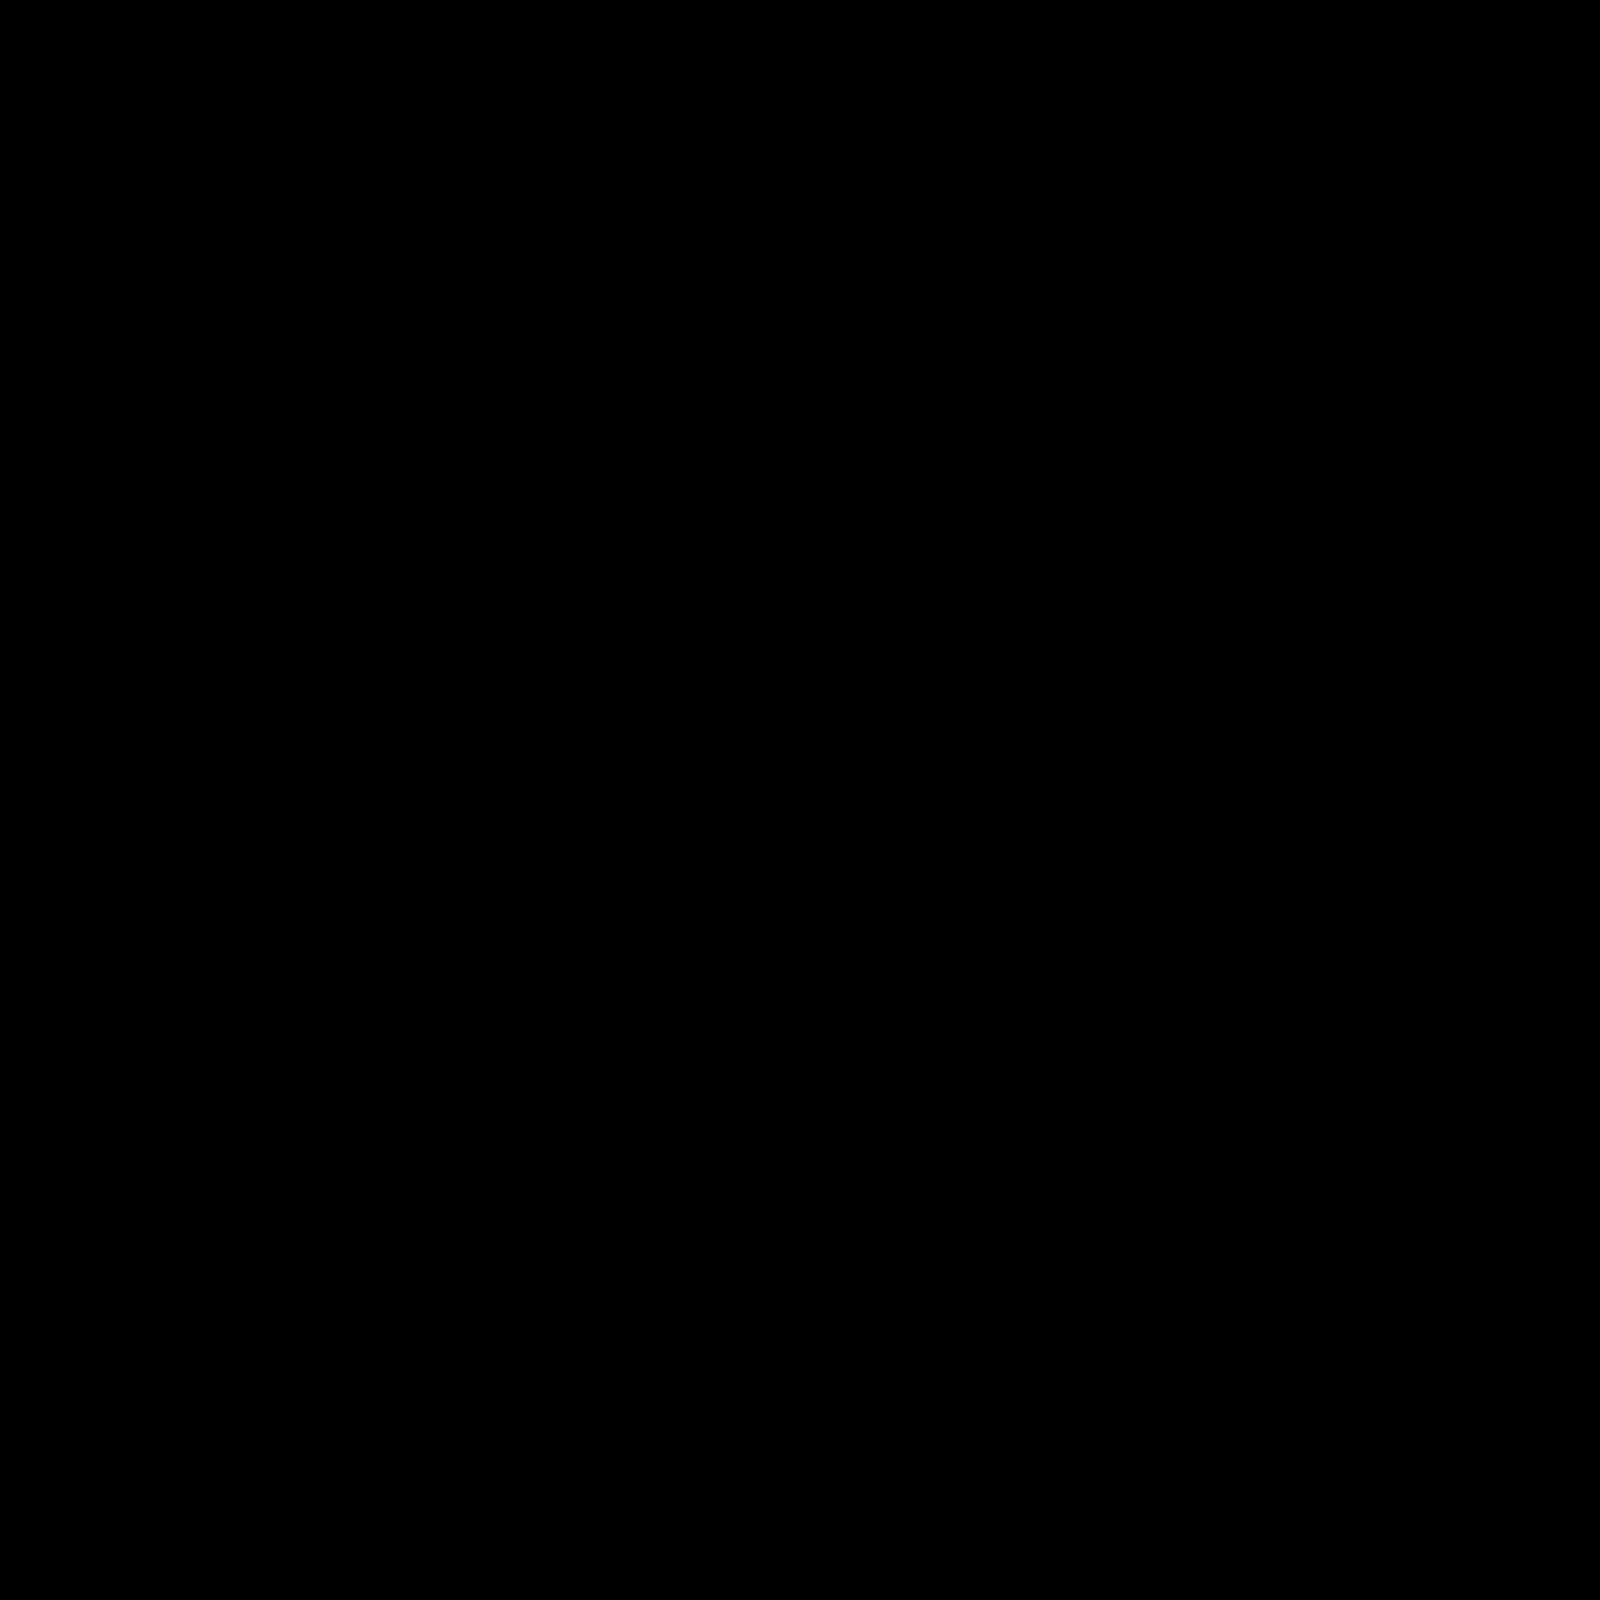 Mapa Finlandii icon